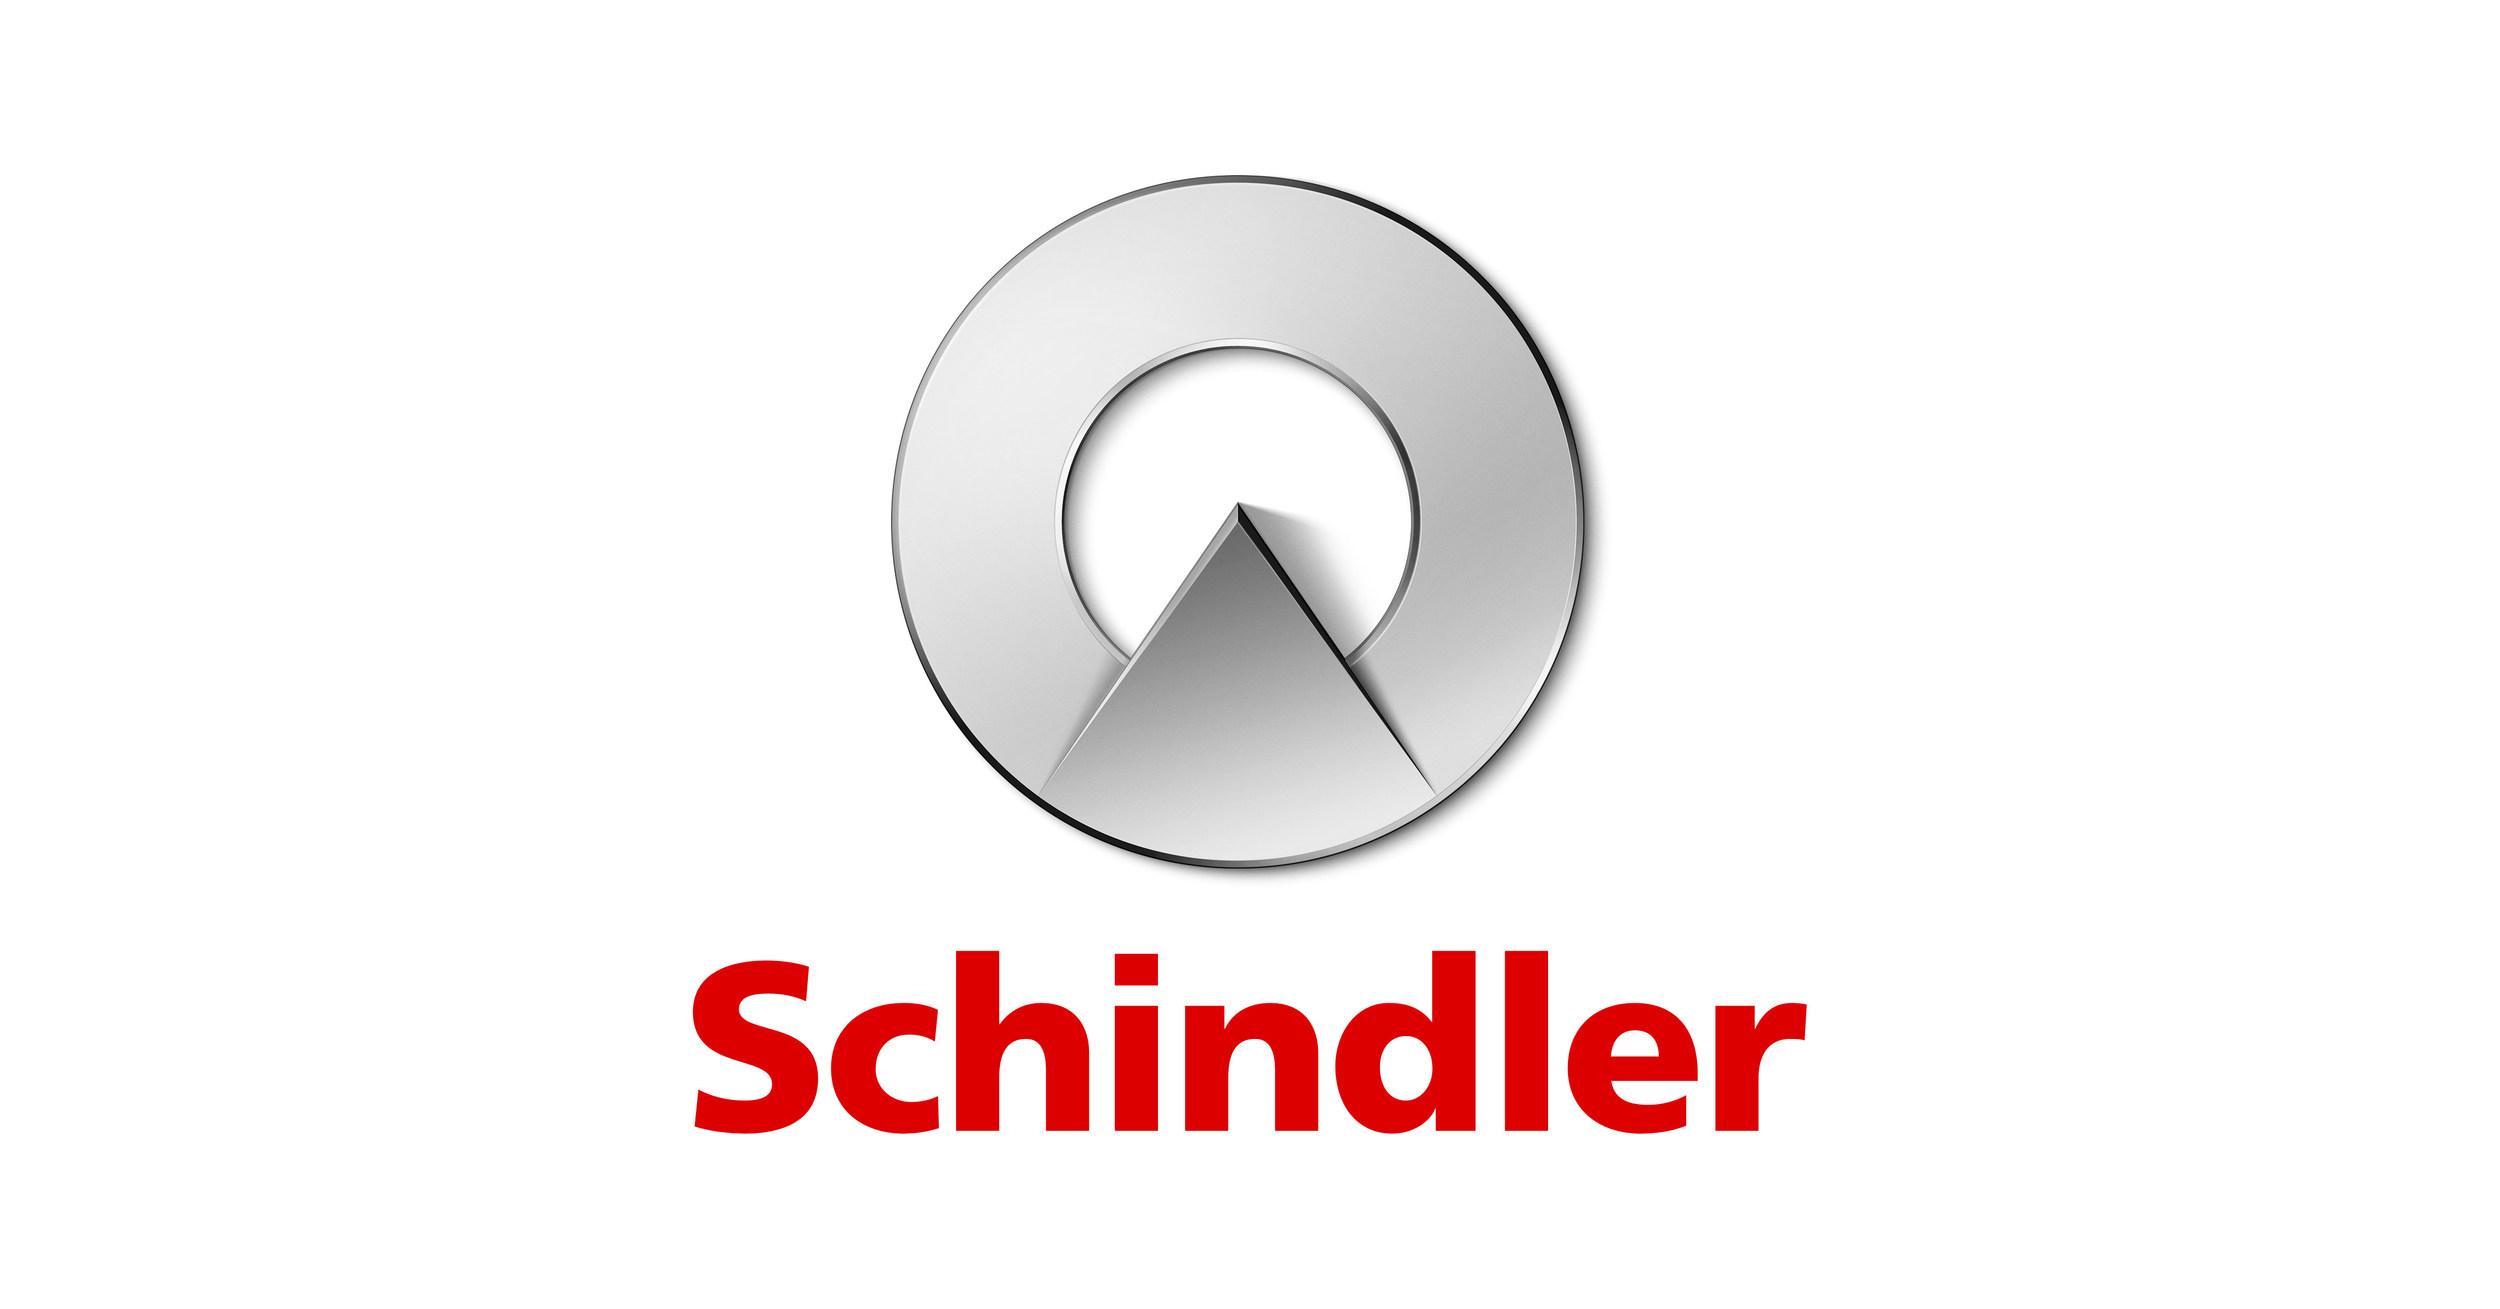 Schindler Debuts Breakthrough Robotic System for Elevators